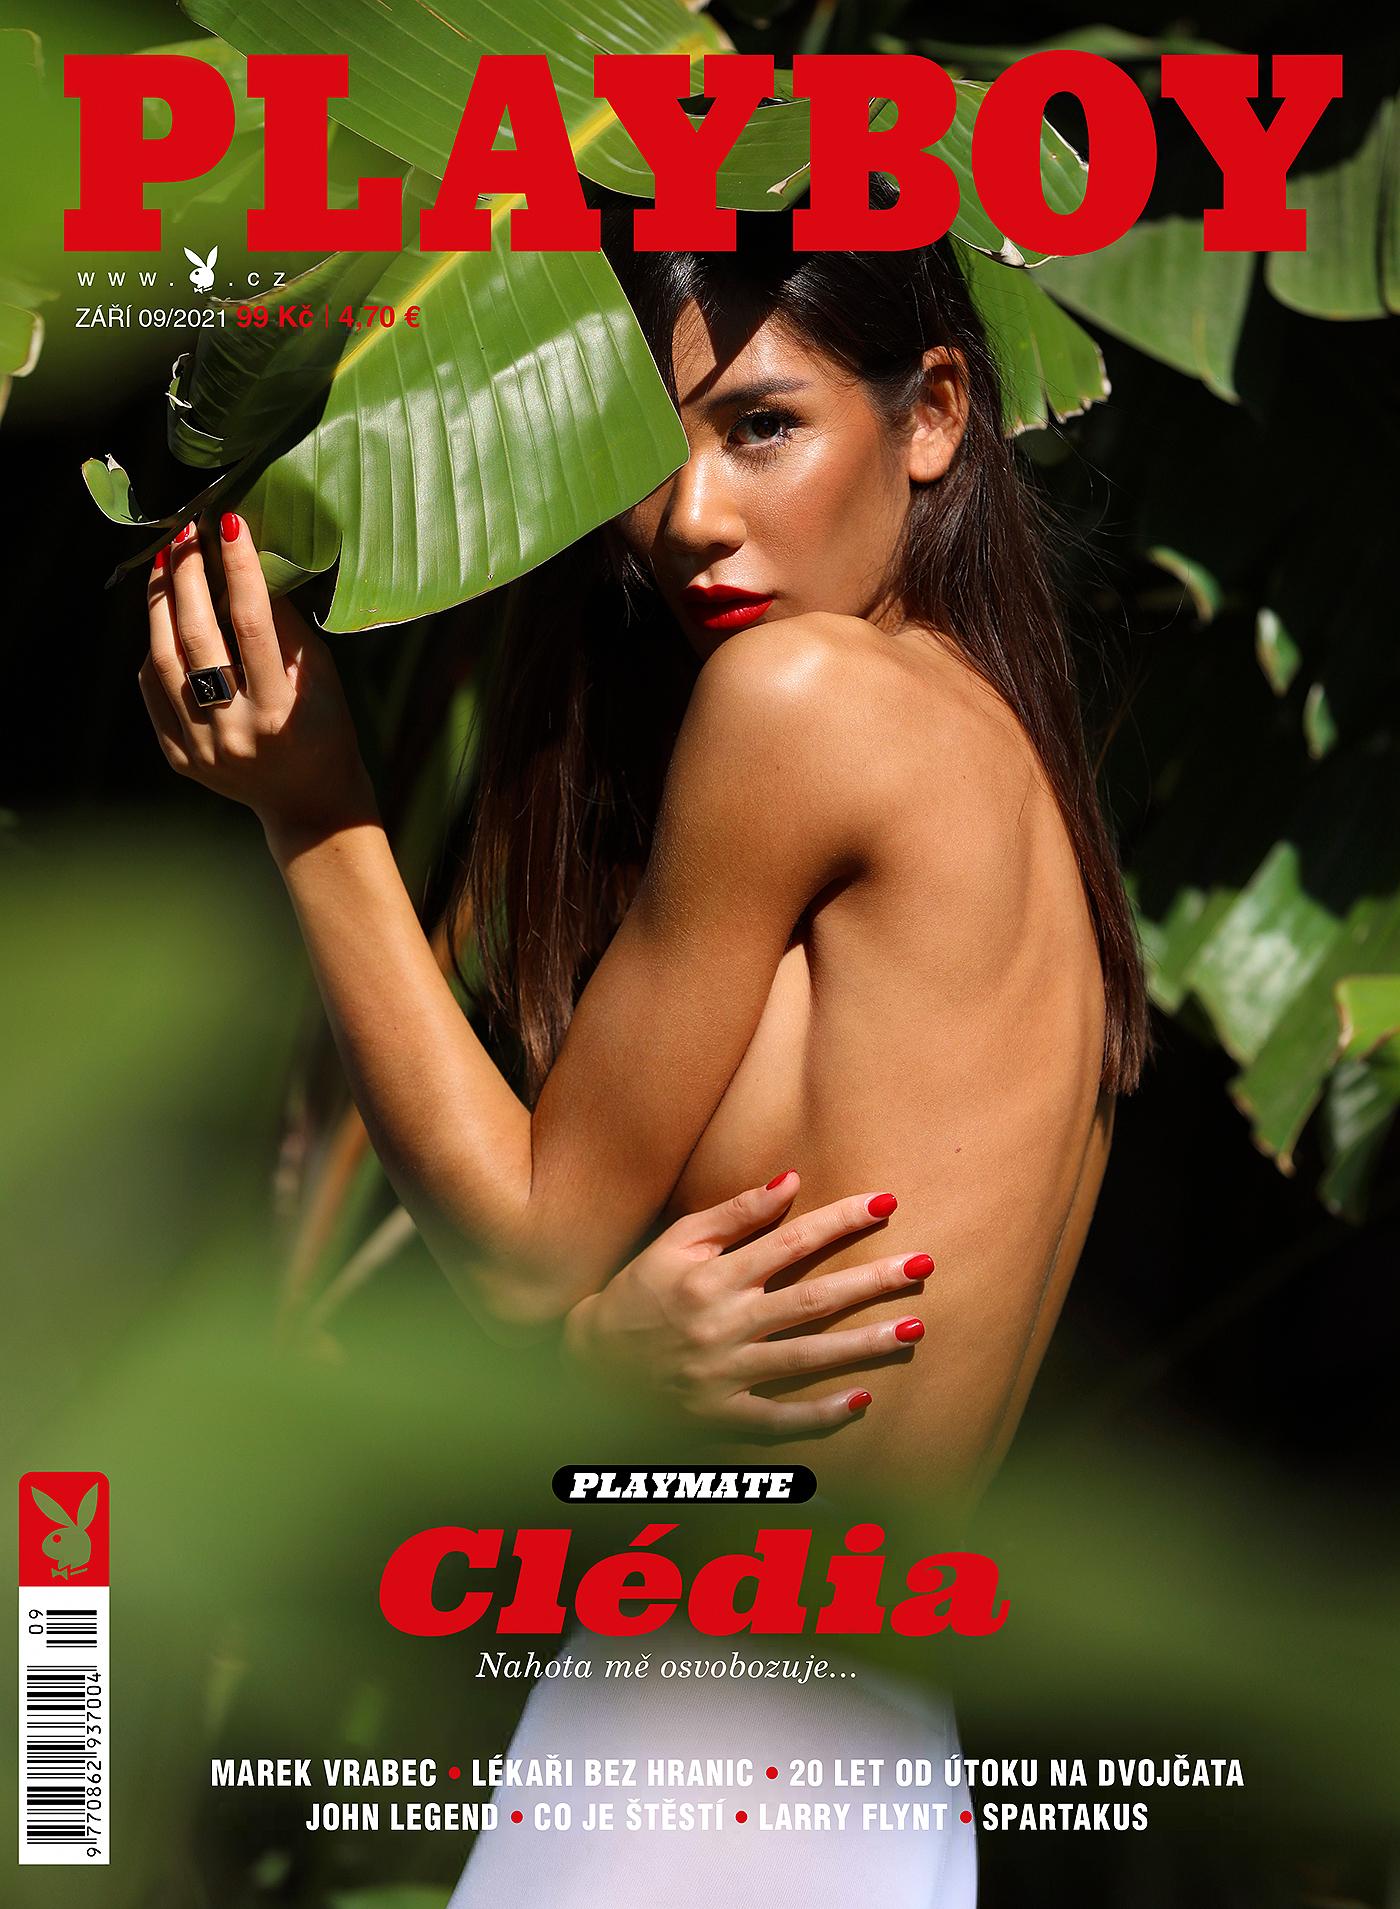 Cledia photographed by Ana Dias